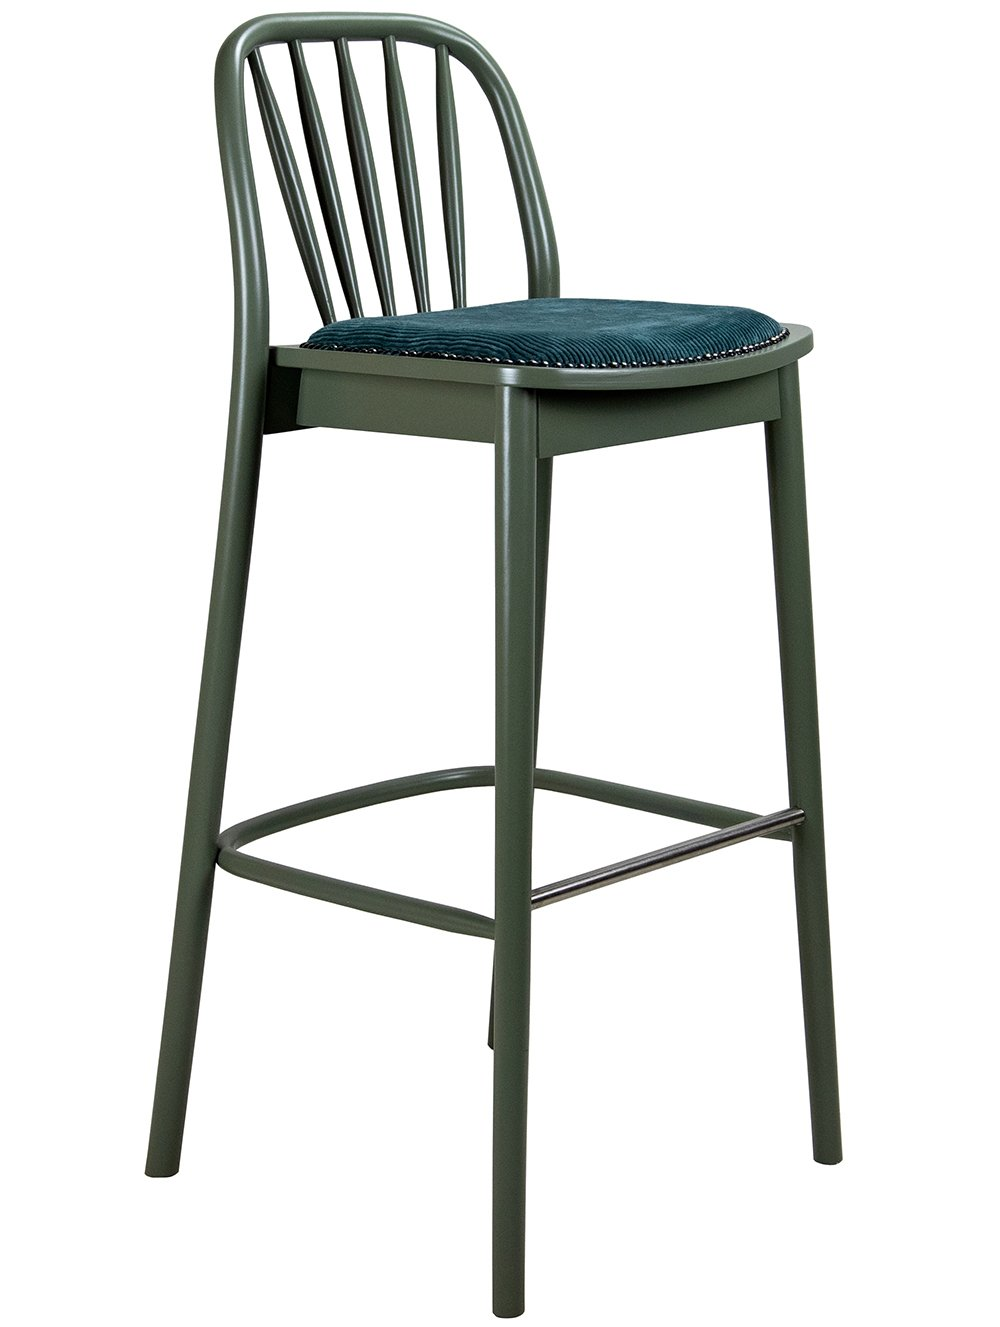 aldgate high stool